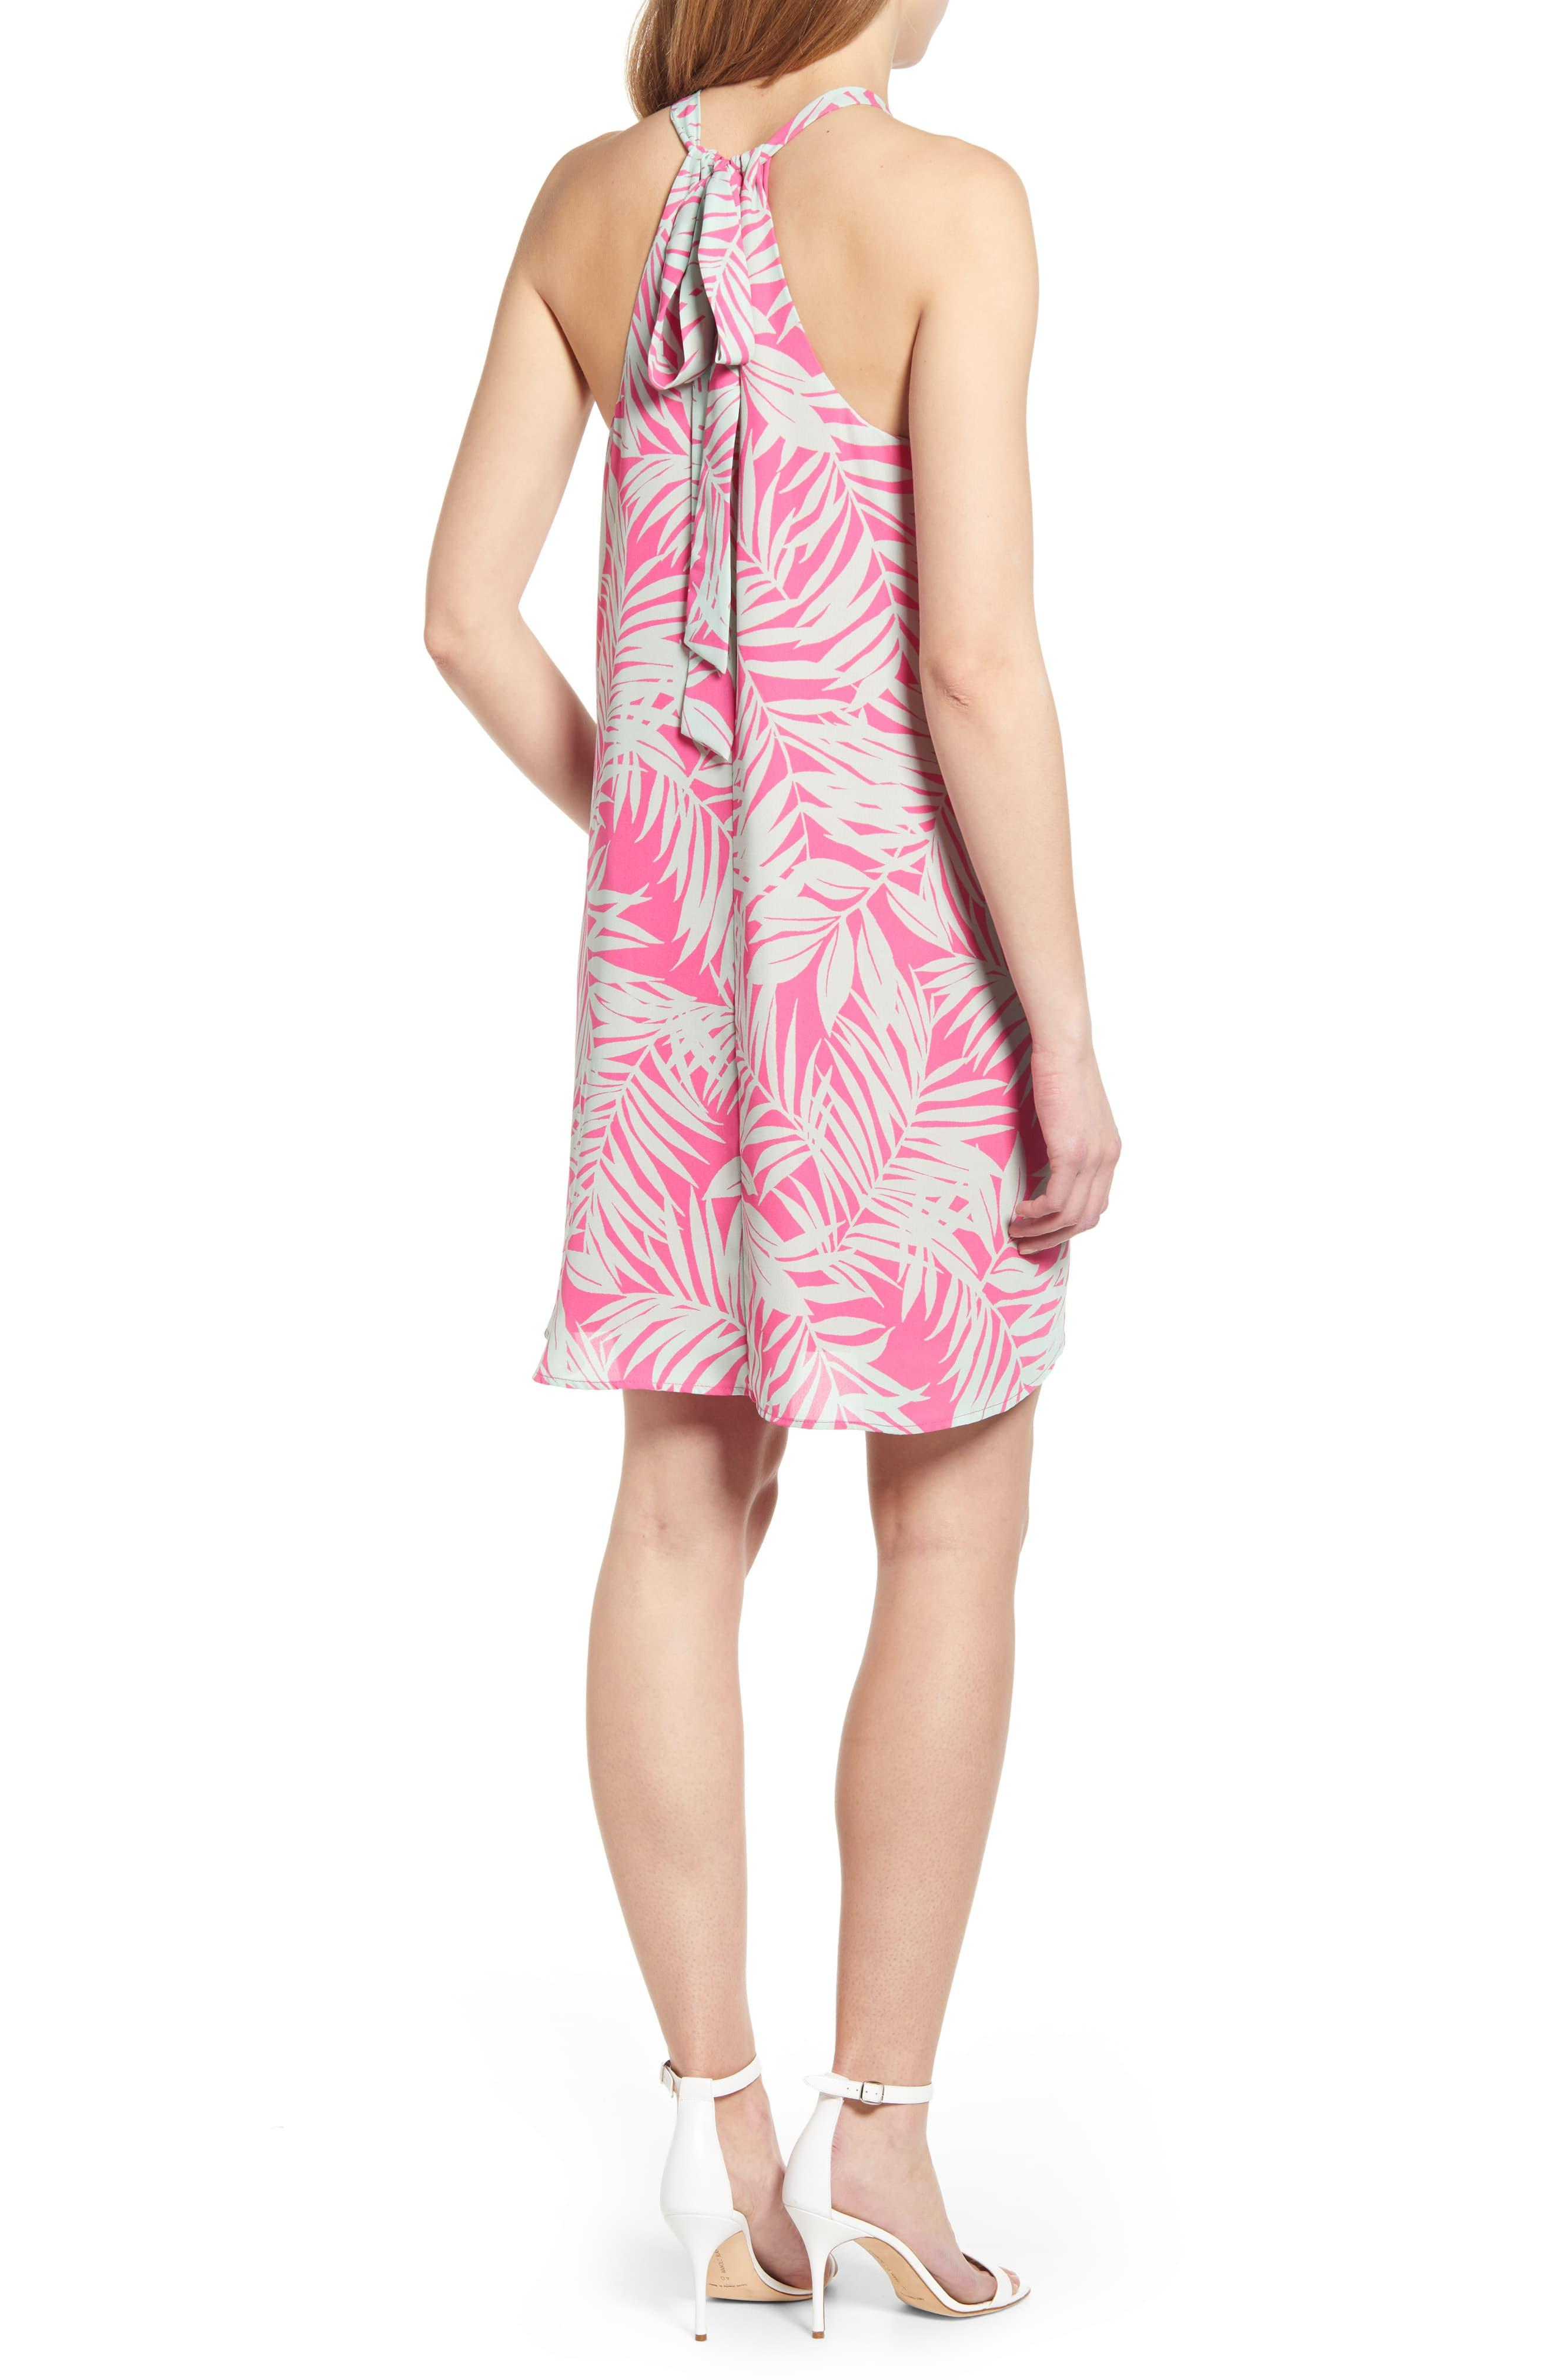 7440b0a24063 Gibson X Hi Sugarplum! Naples Swing Halter Dress in Pink - Lyst